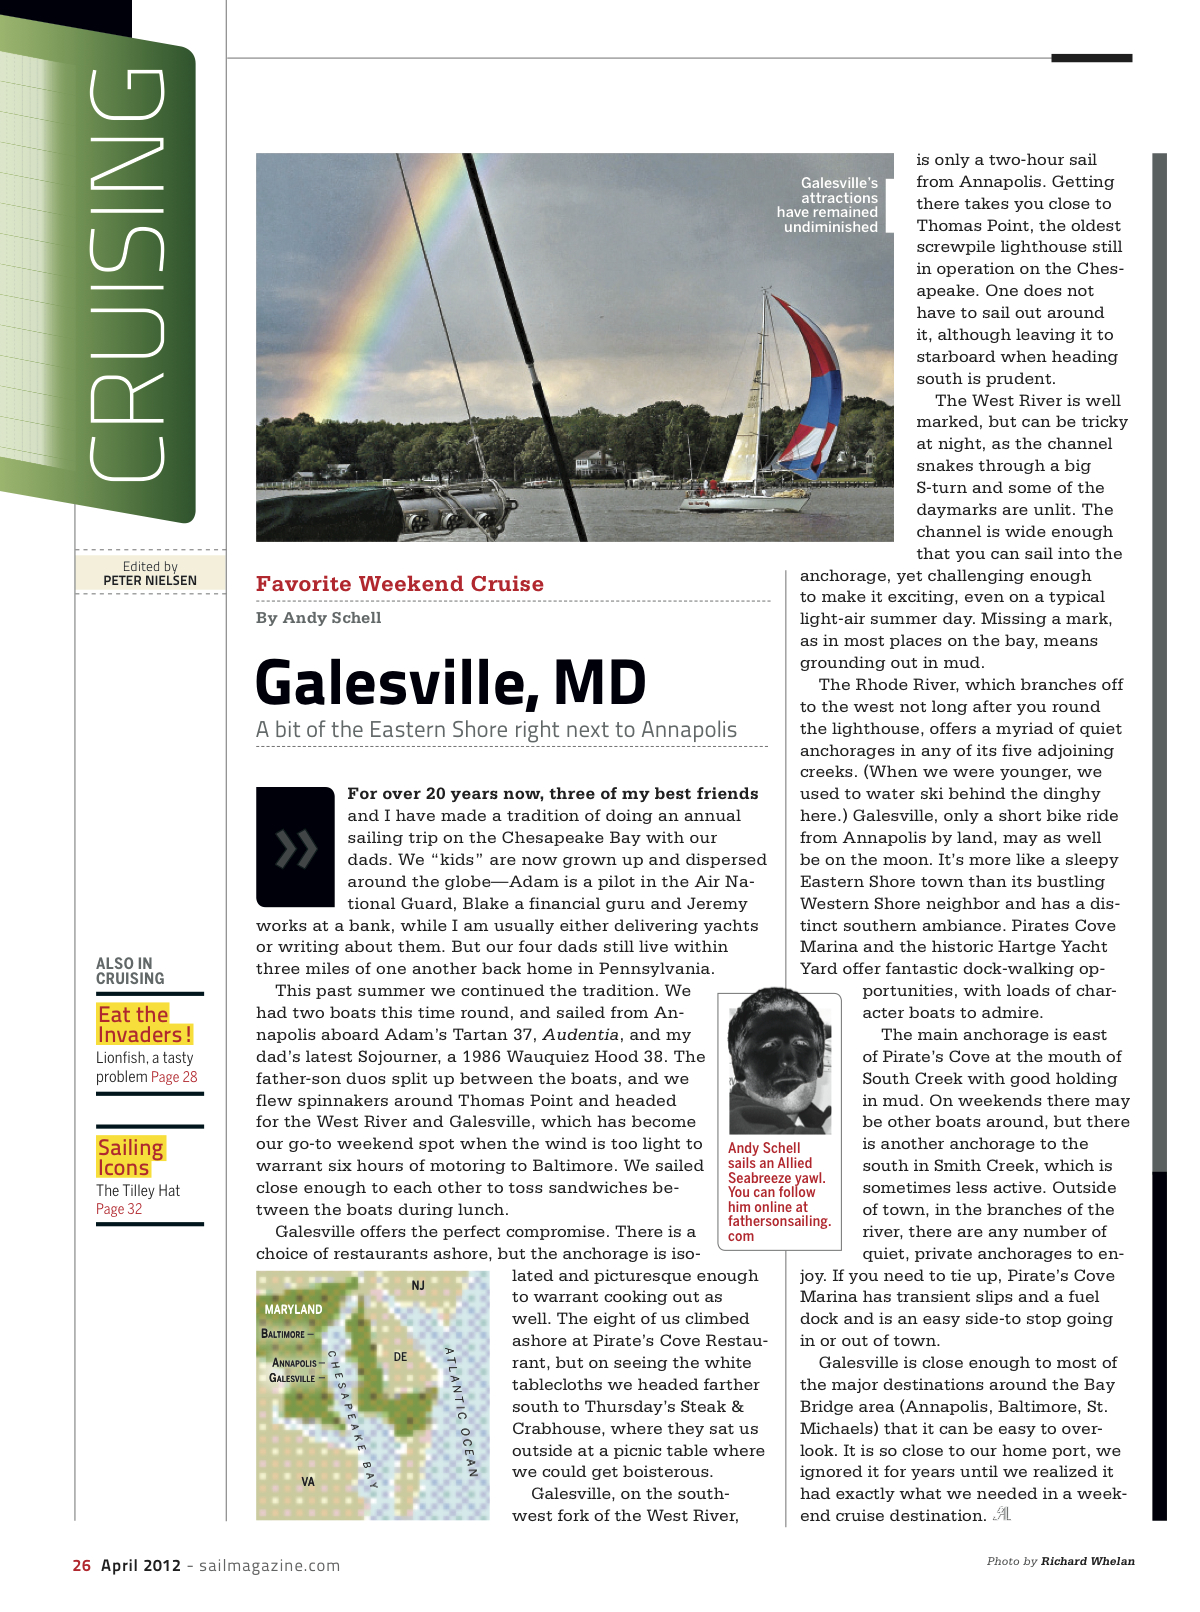 SAIL: Galesville Cruise